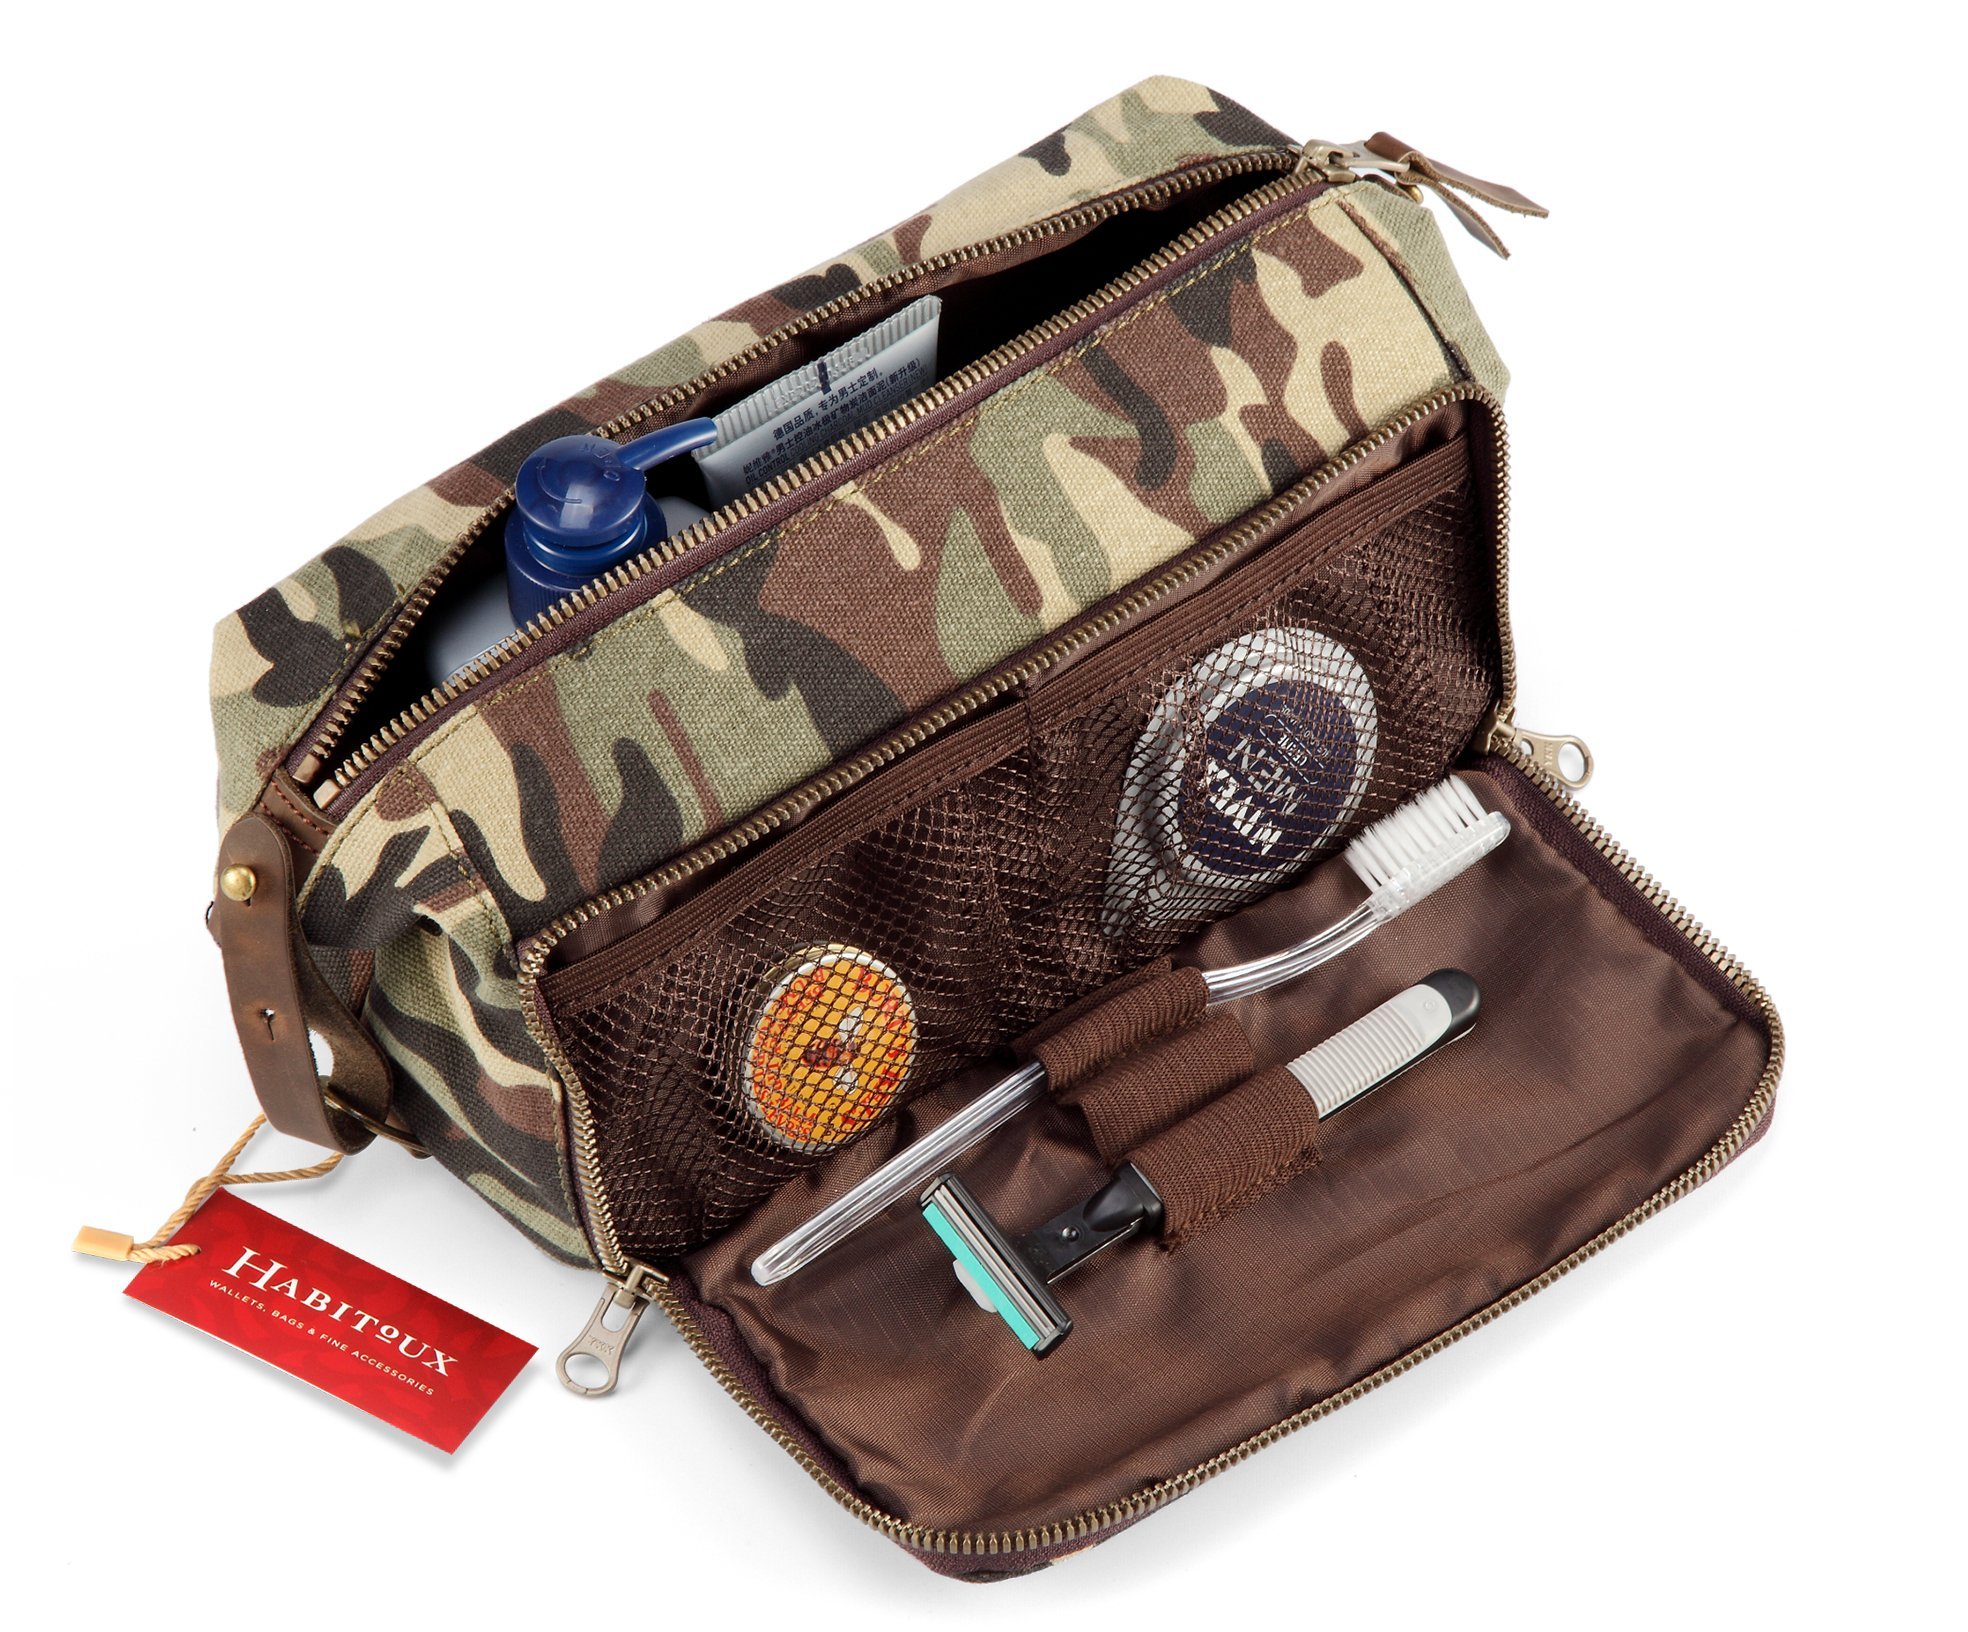 DOPP Kit Mens Toiletry Travel Bag YKK Zipper Canvas & Leather (Medium, Woodland Camo)